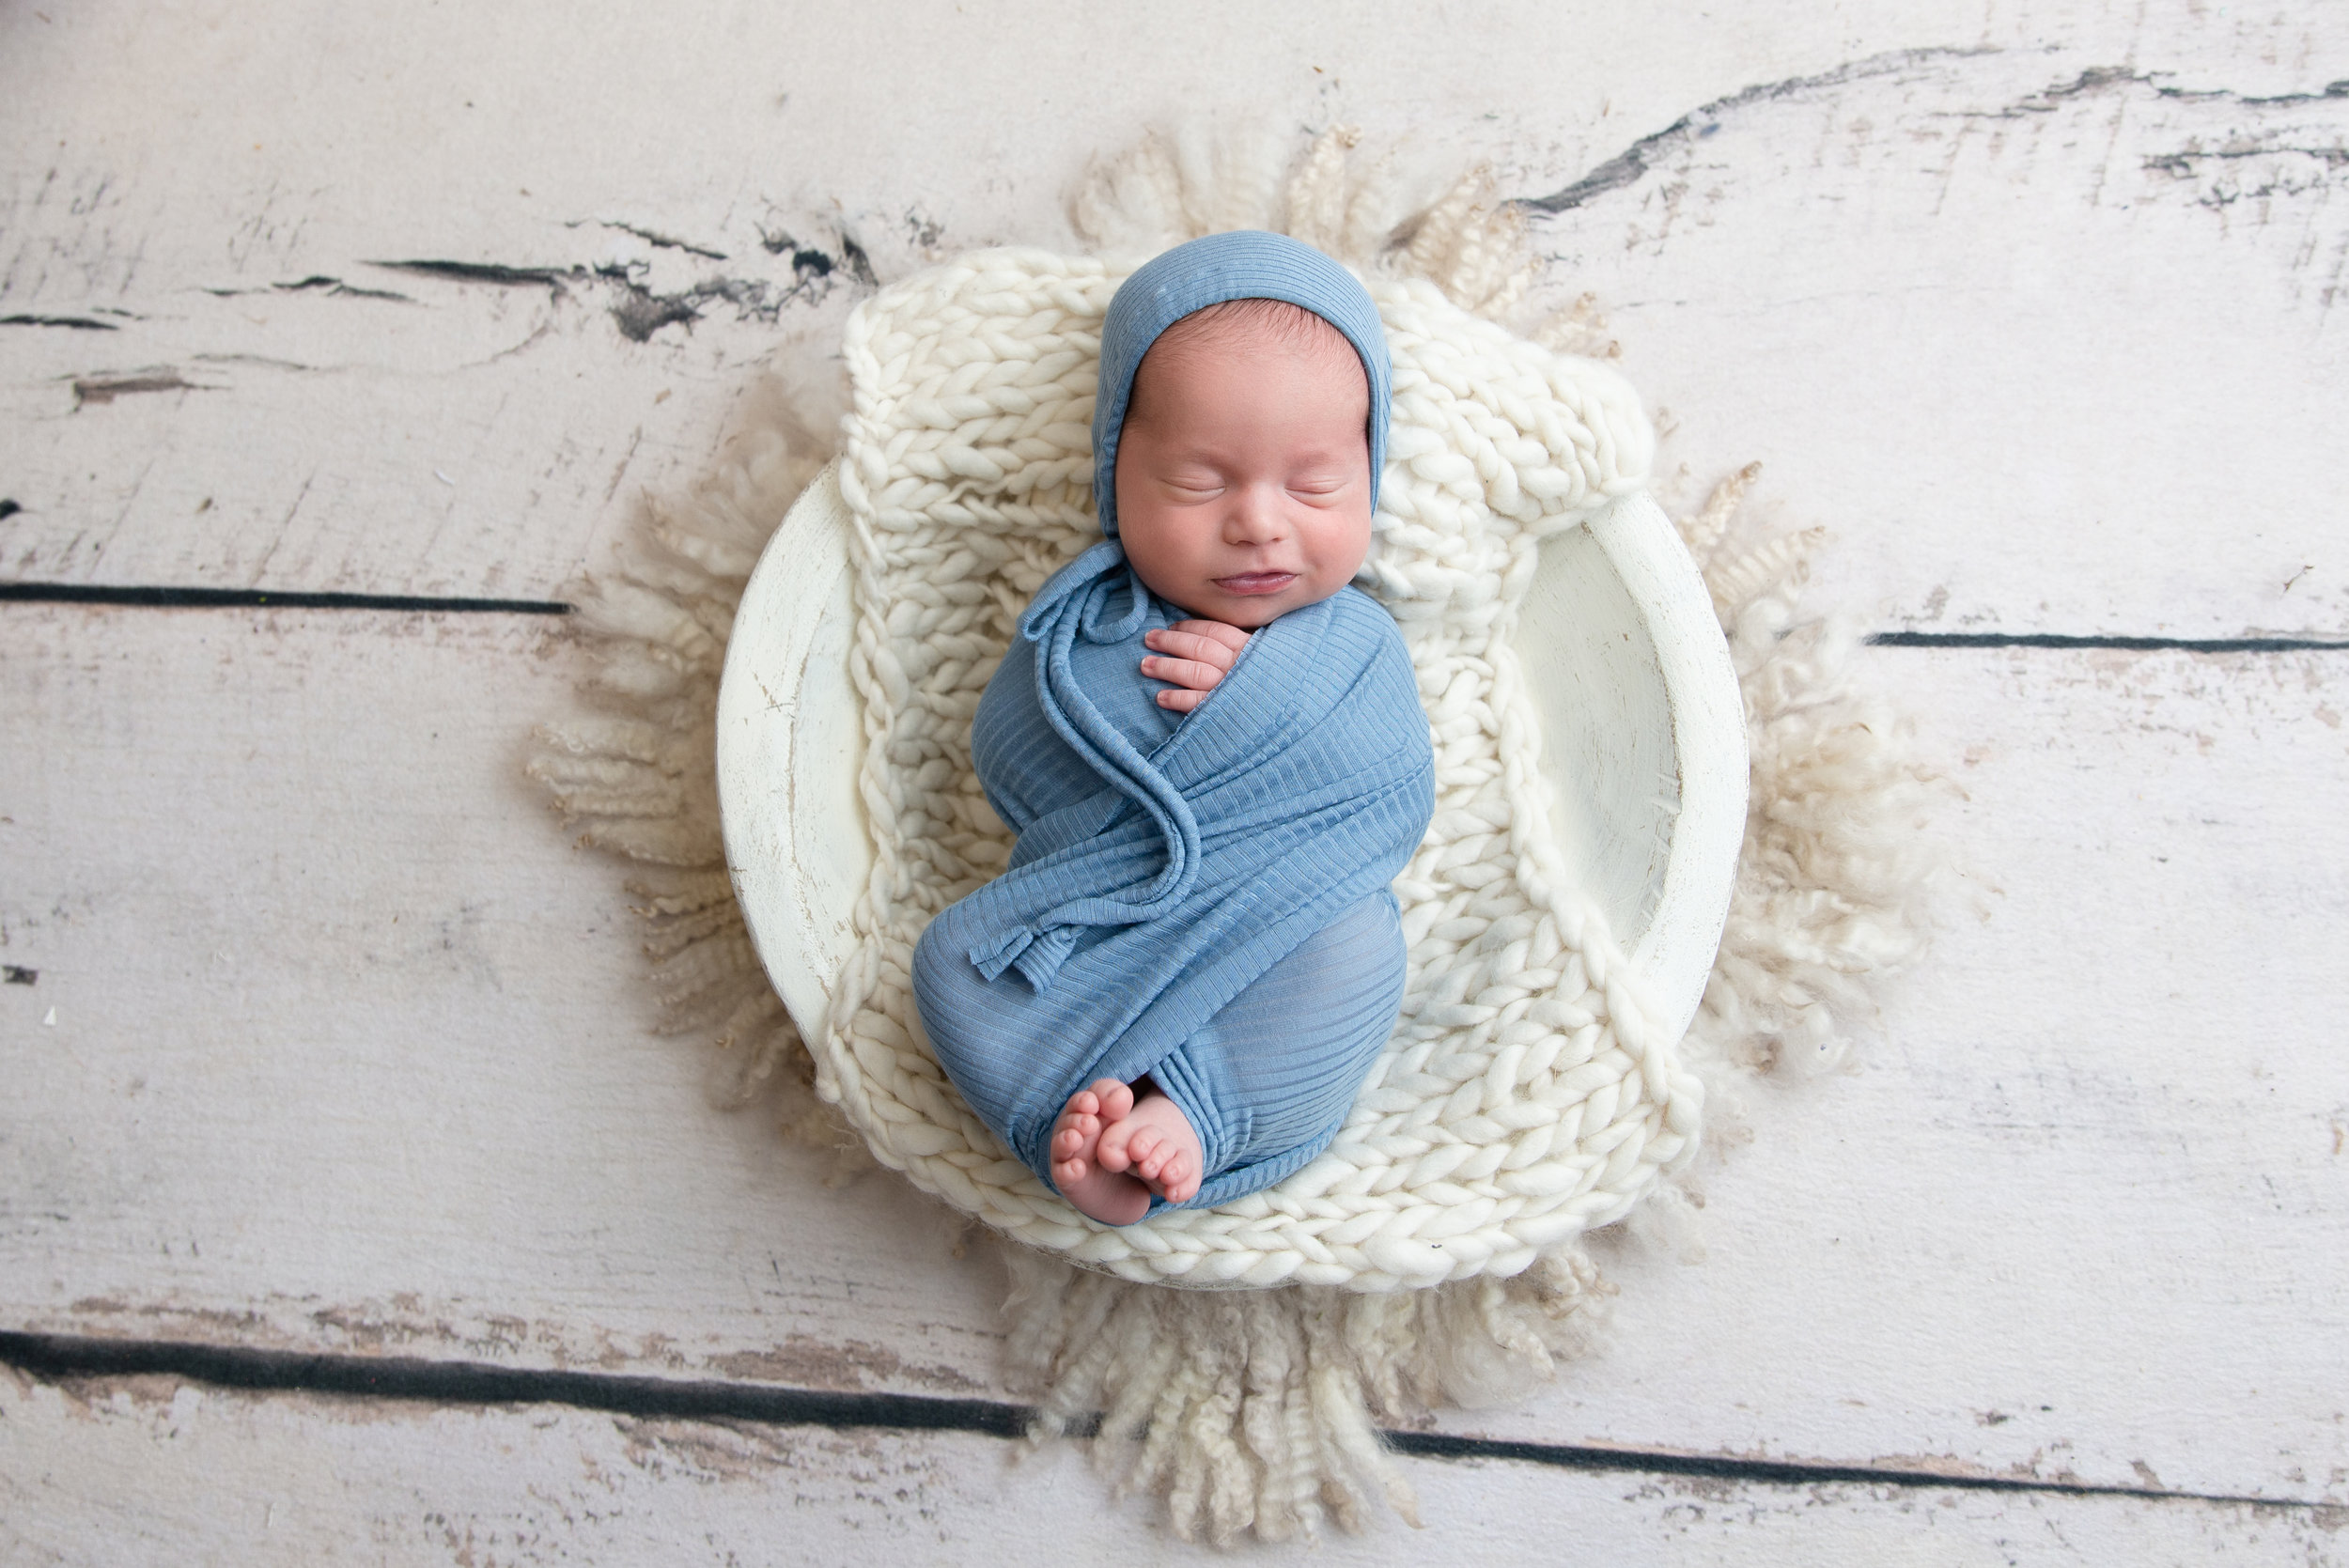 st-louis-newborn-photographer-baby-boy-wrapped-in-light-blue-smiling-on-white-floor.jpg